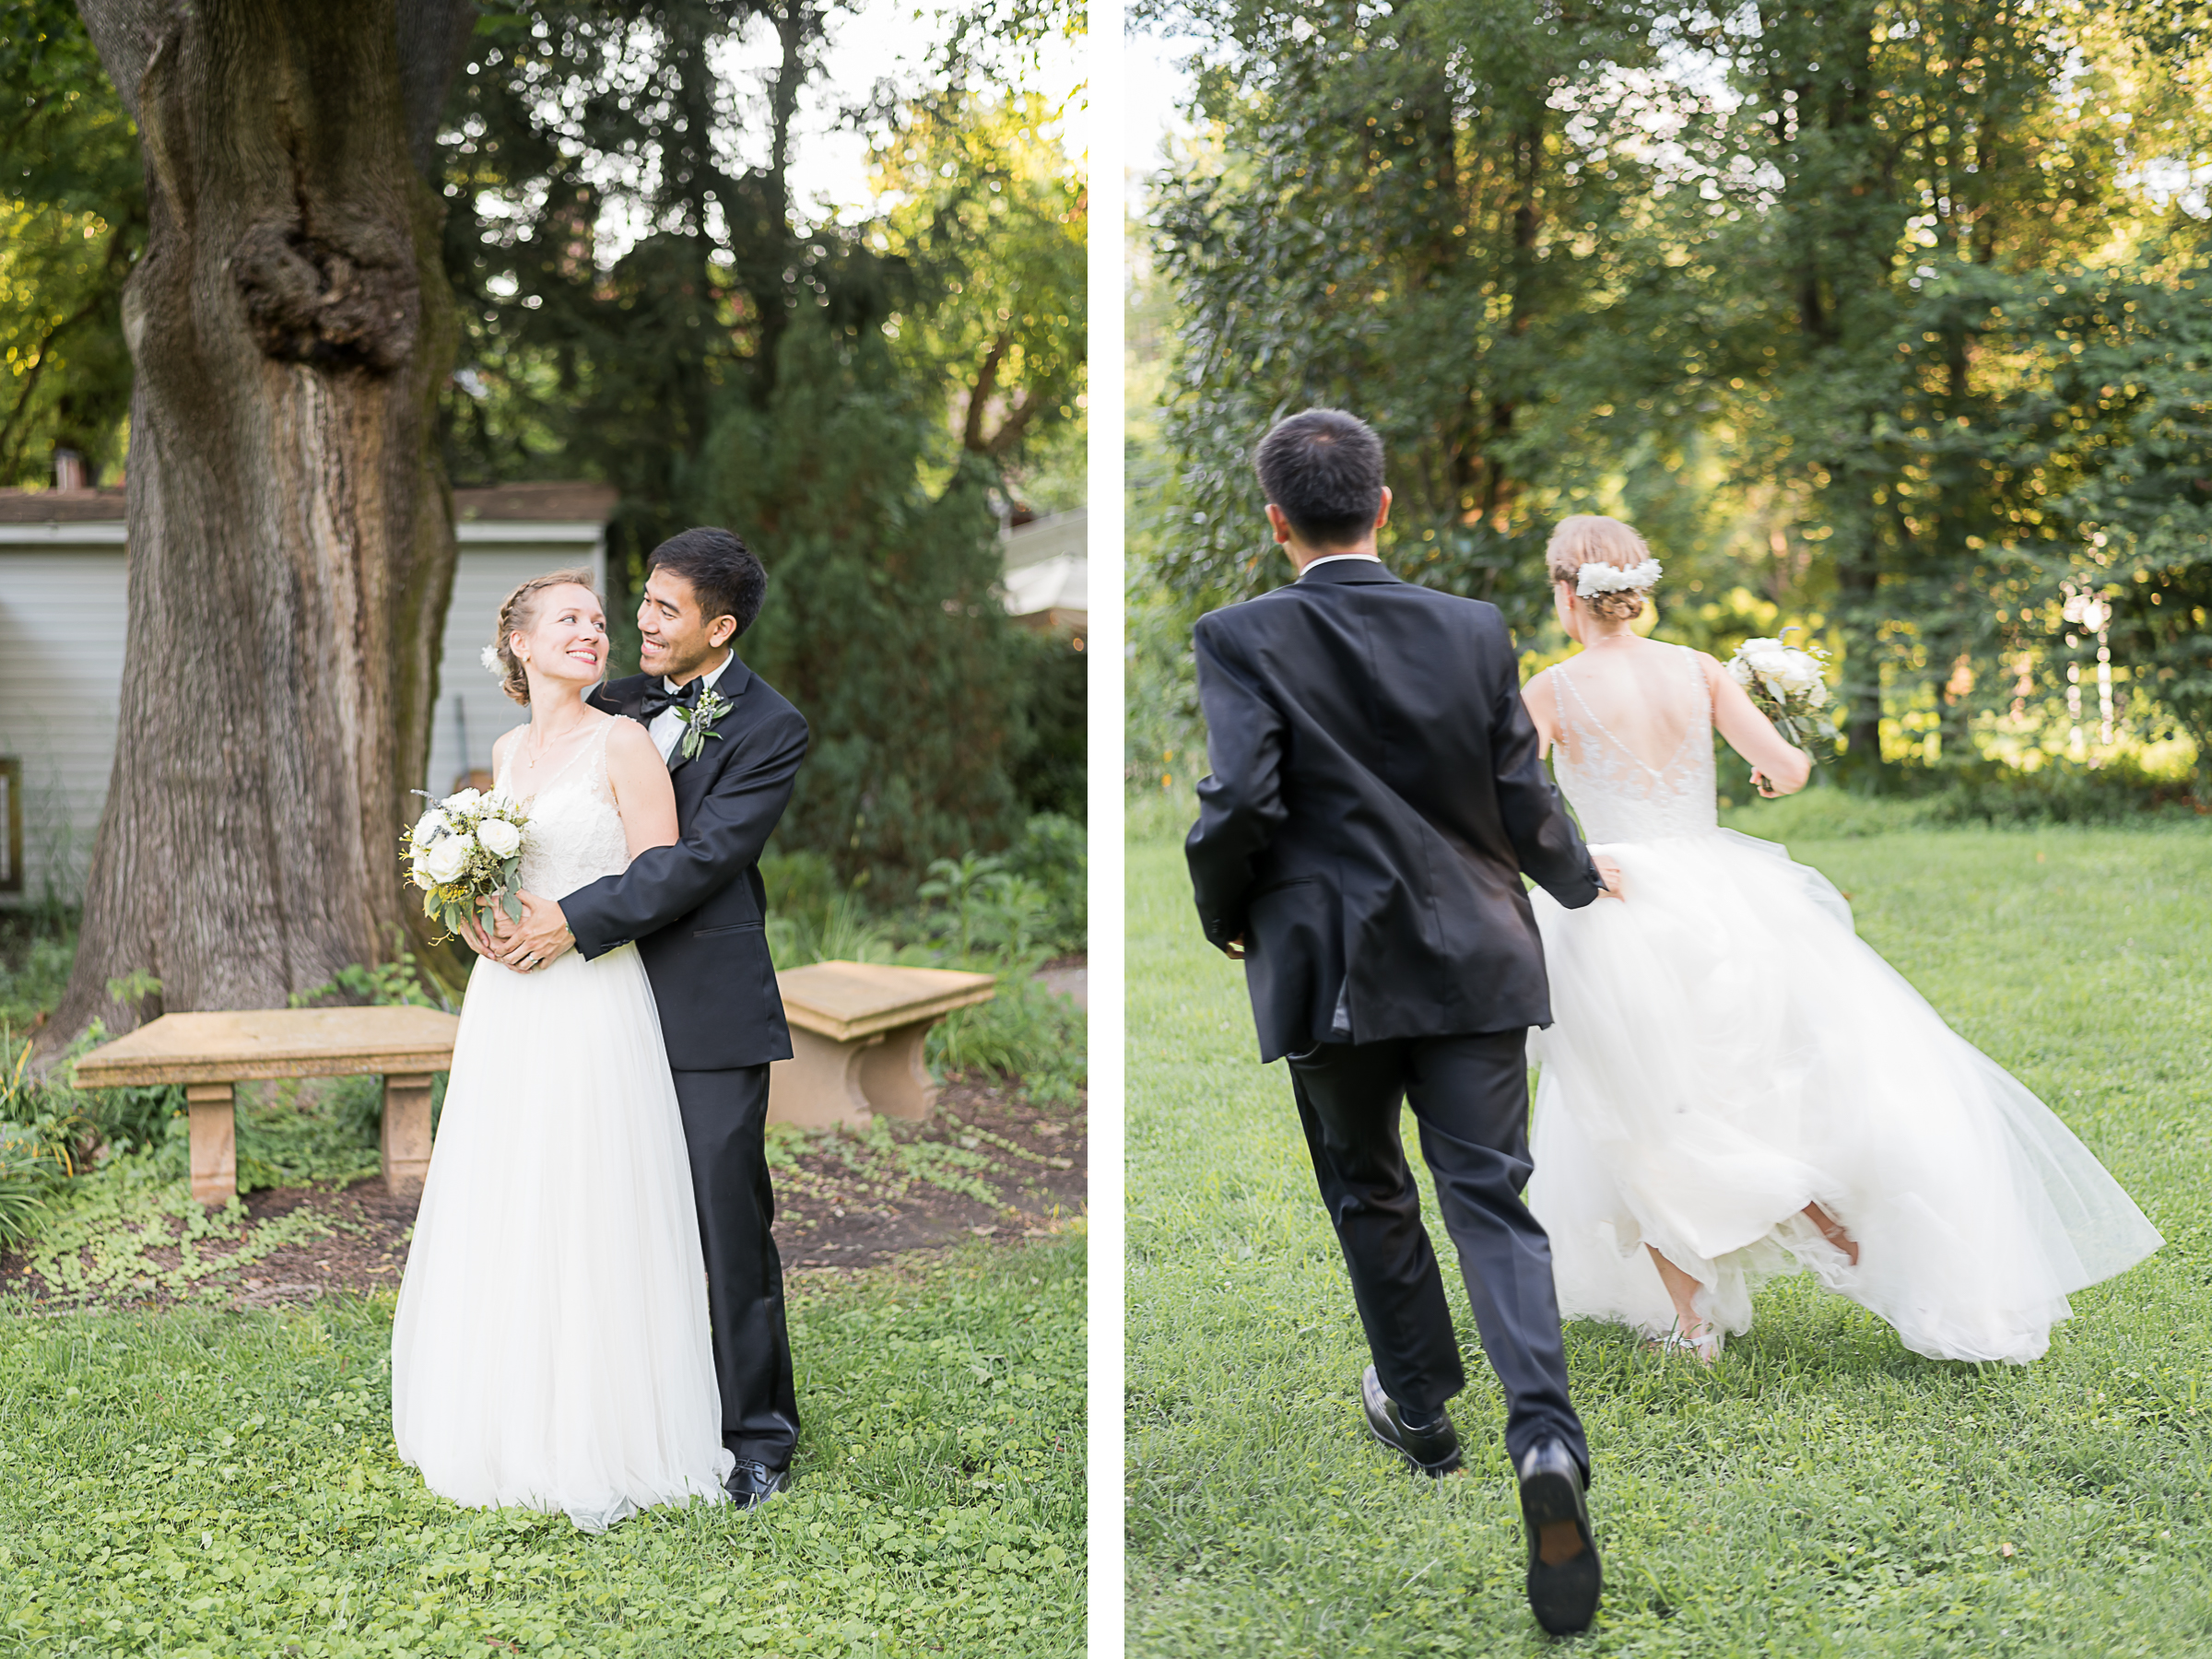 Elkridge-Furnace-Inn-Wedding-Bride-Groom-Running